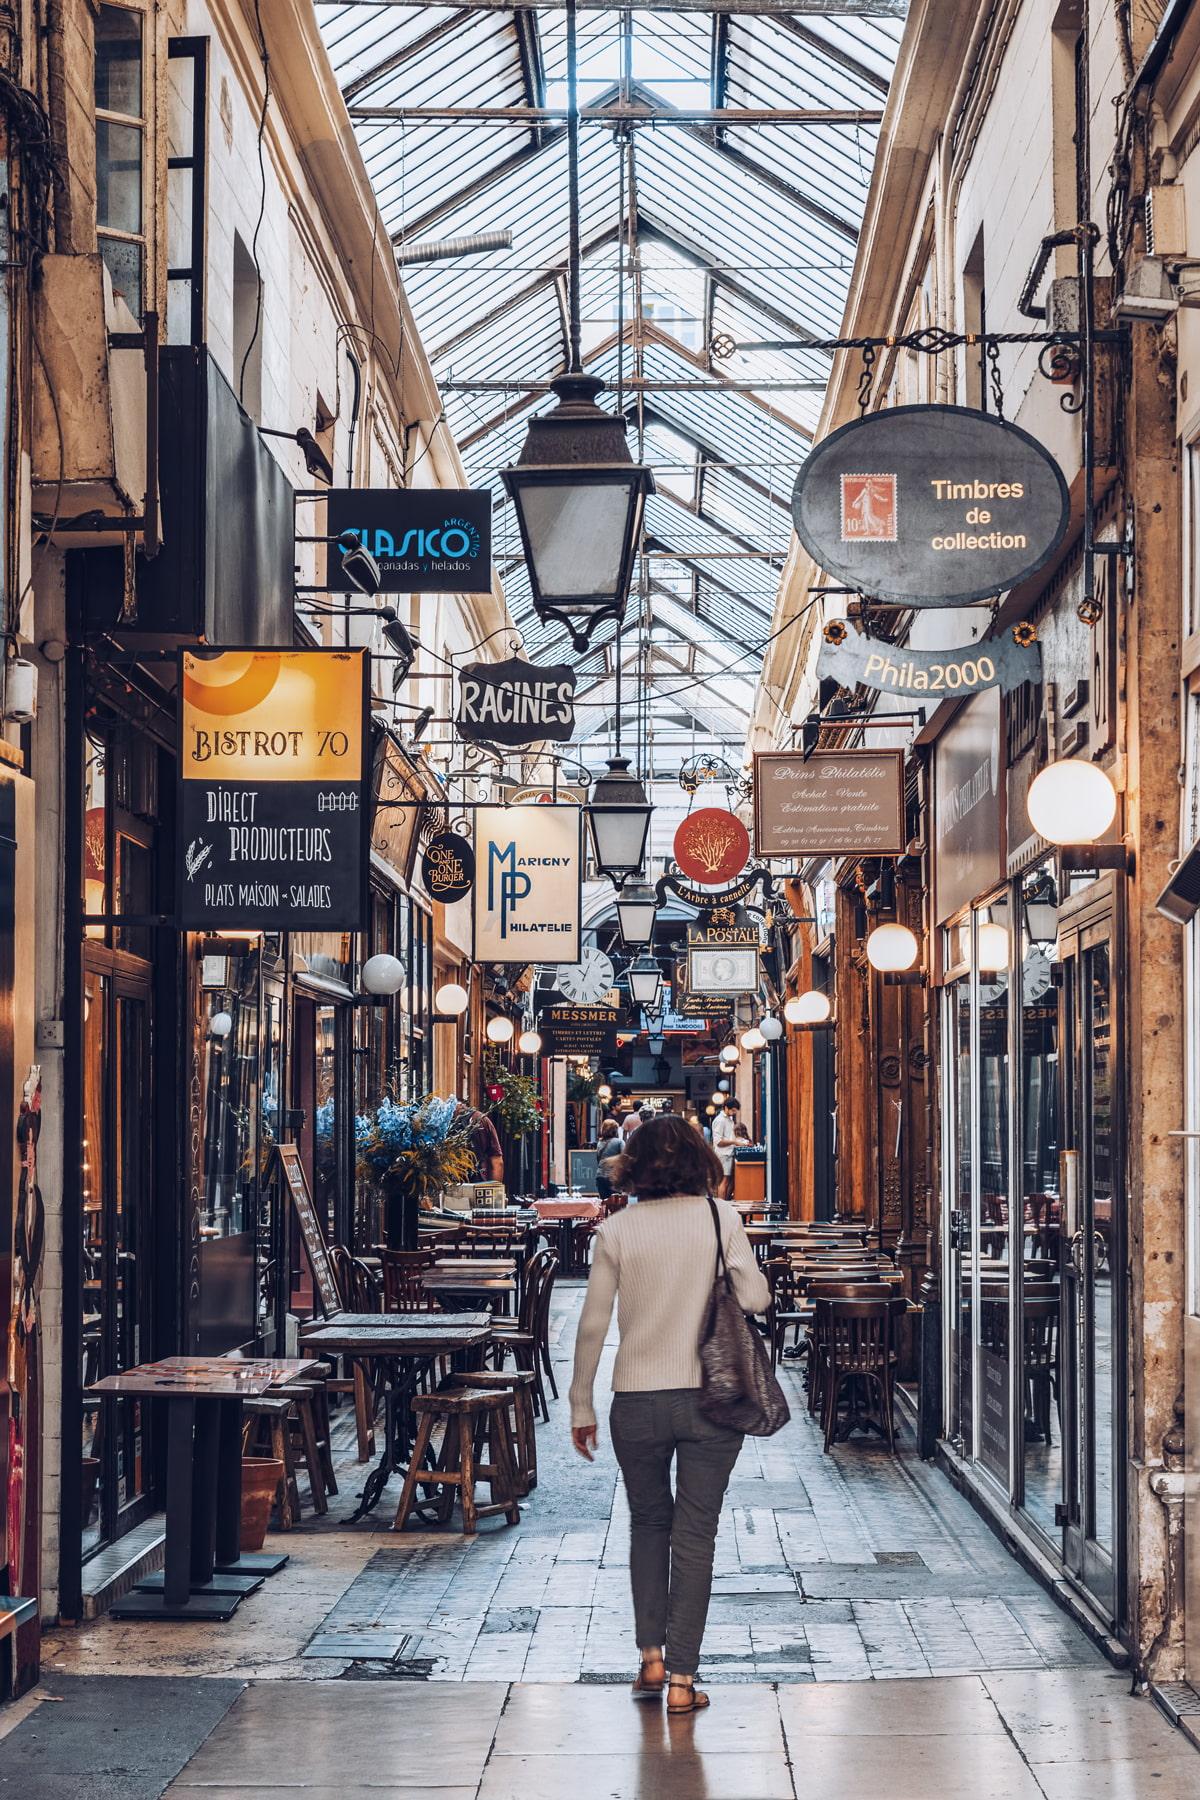 Passage des Panoramas, Paris